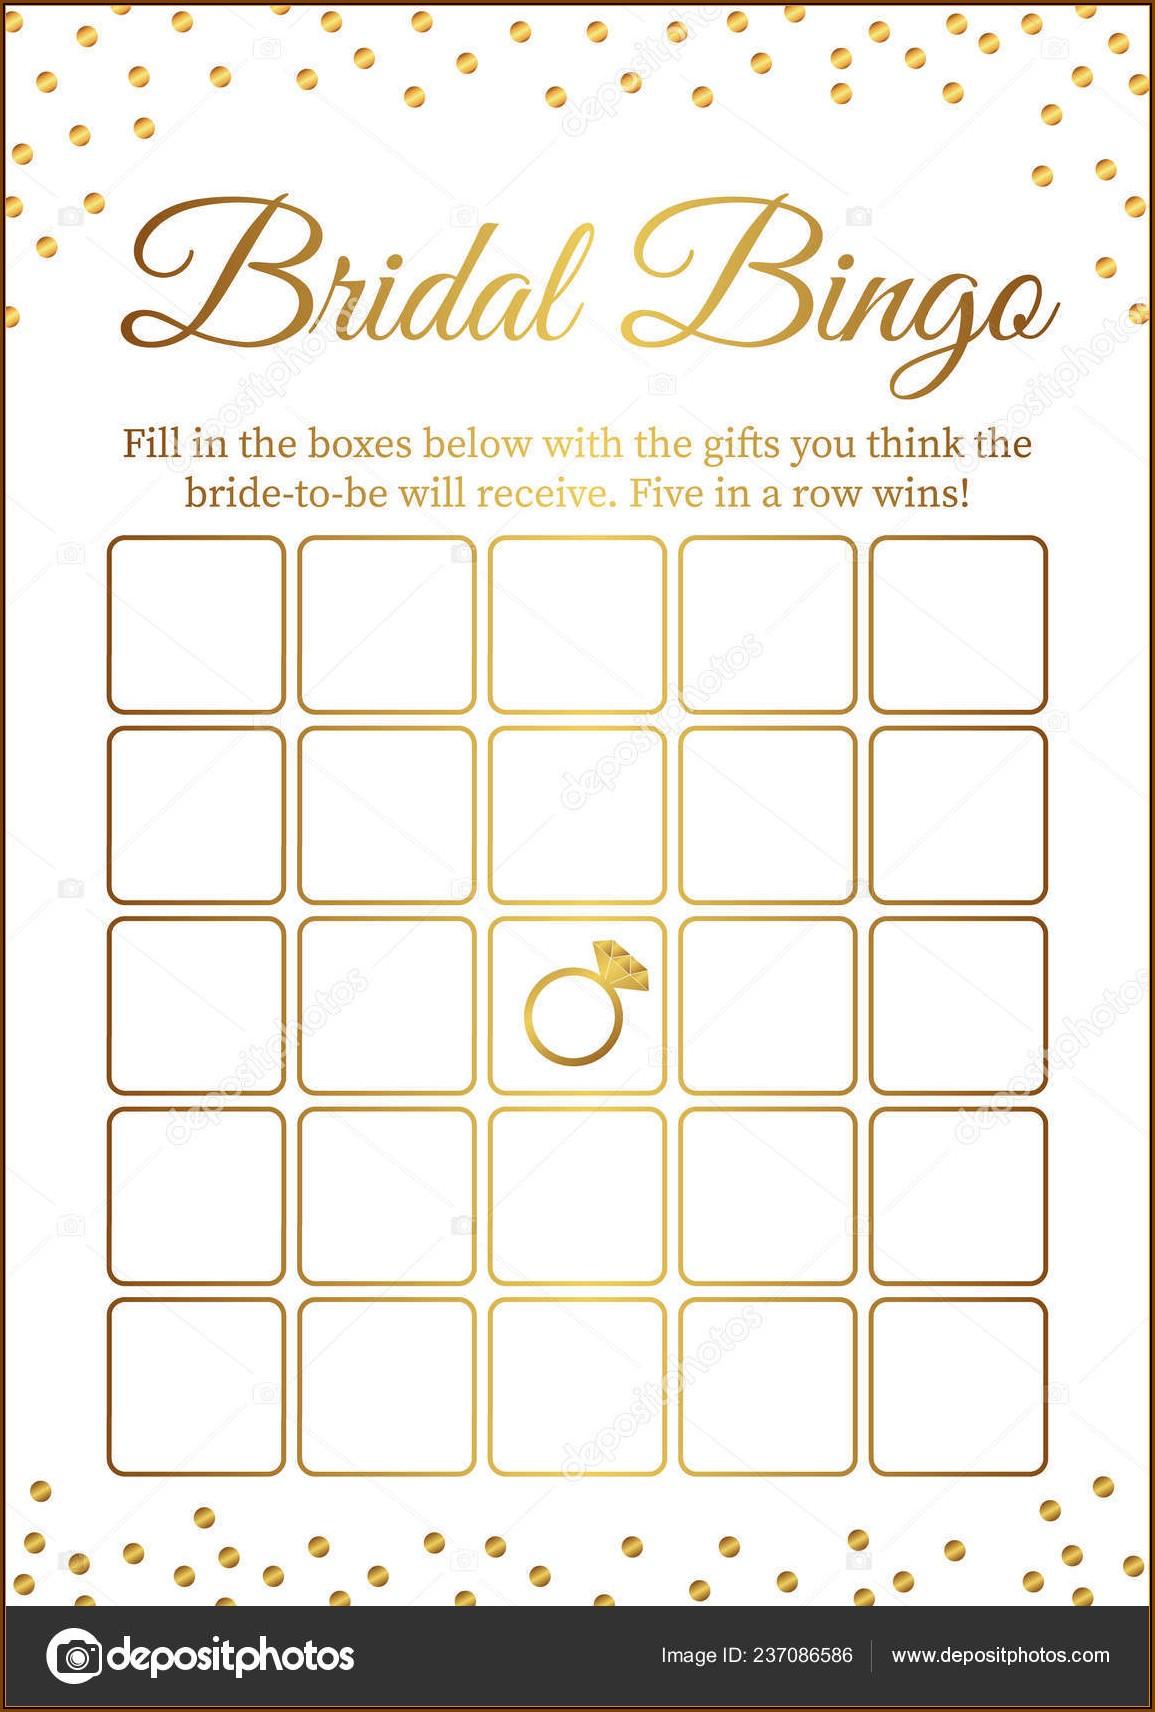 Bridal Bingo Template